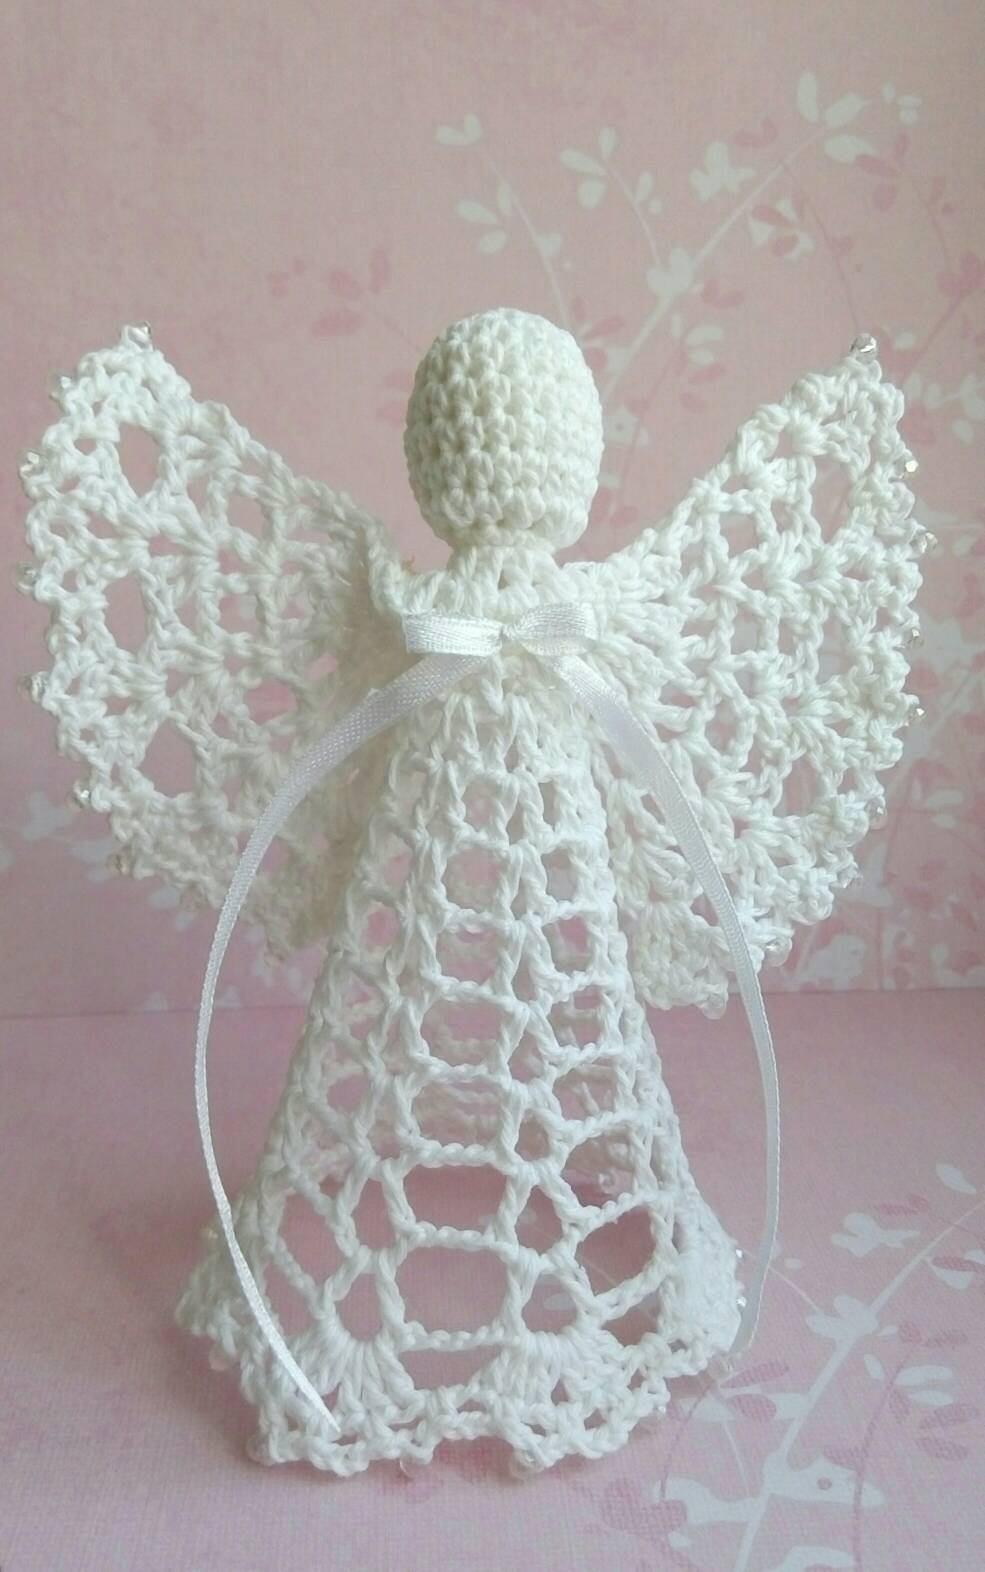 wei er engel spitze engel h keln angel perlen engel. Black Bedroom Furniture Sets. Home Design Ideas